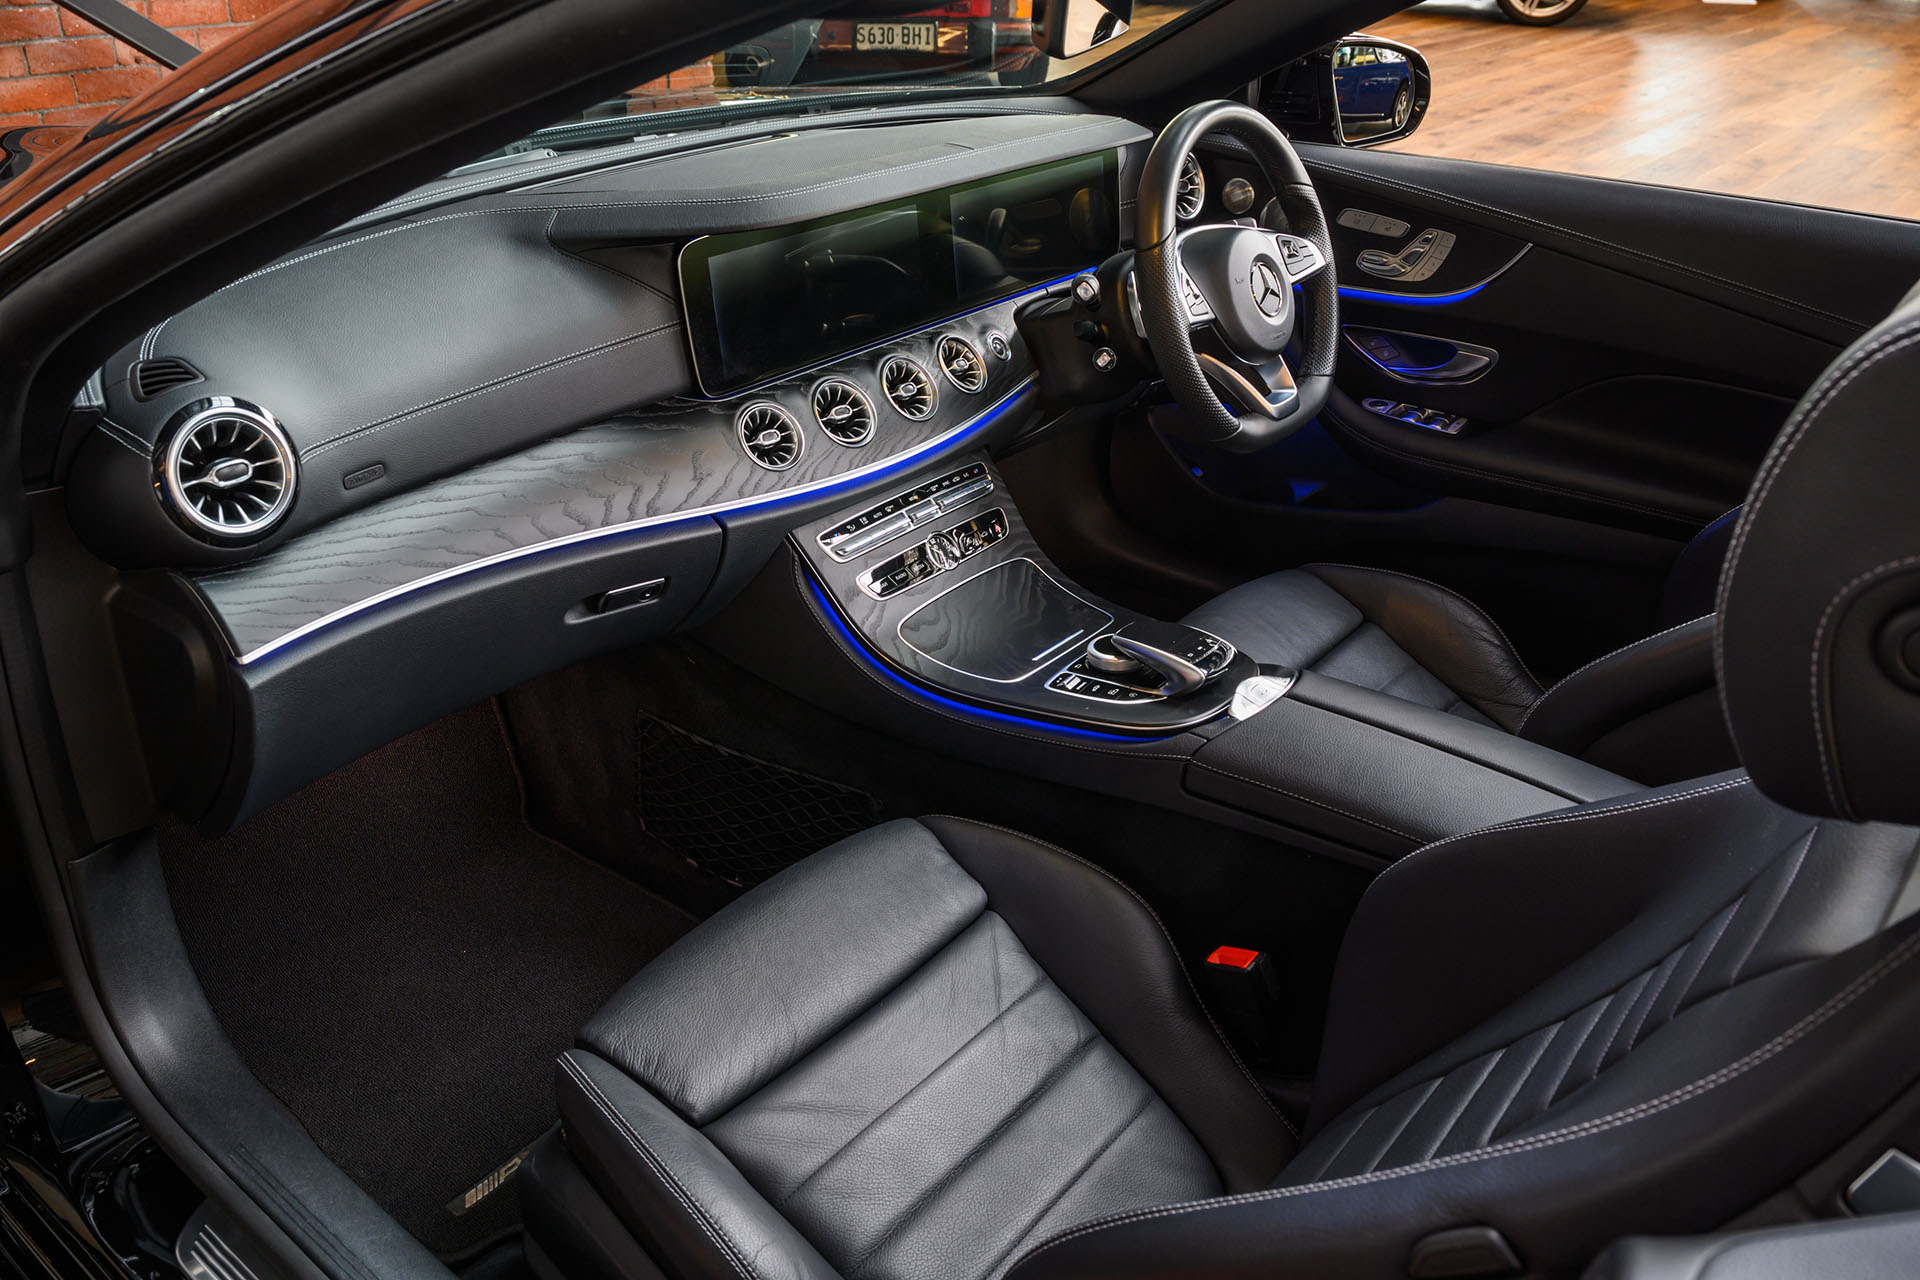 Mercedes E400 Convertible >> 2017 Mercedes Benz E400 Cabriolet - Richmonds - Classic ...